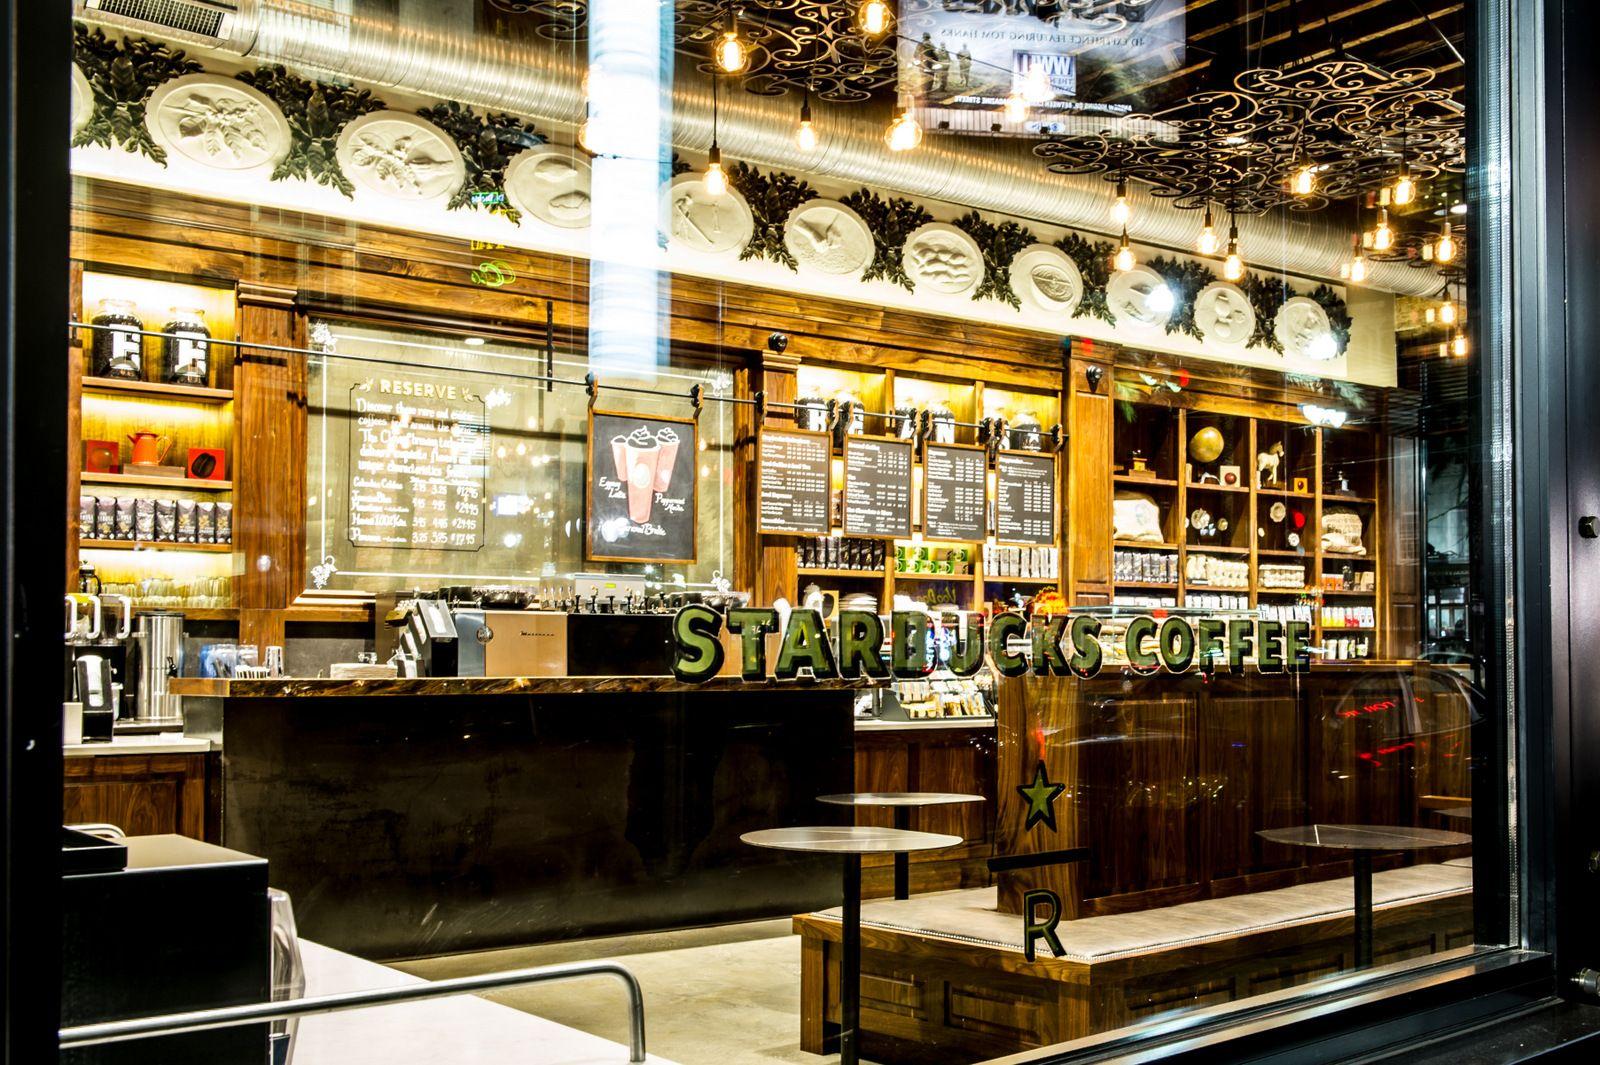 starbucks canal street new orleans interior restaurants bars. Black Bedroom Furniture Sets. Home Design Ideas